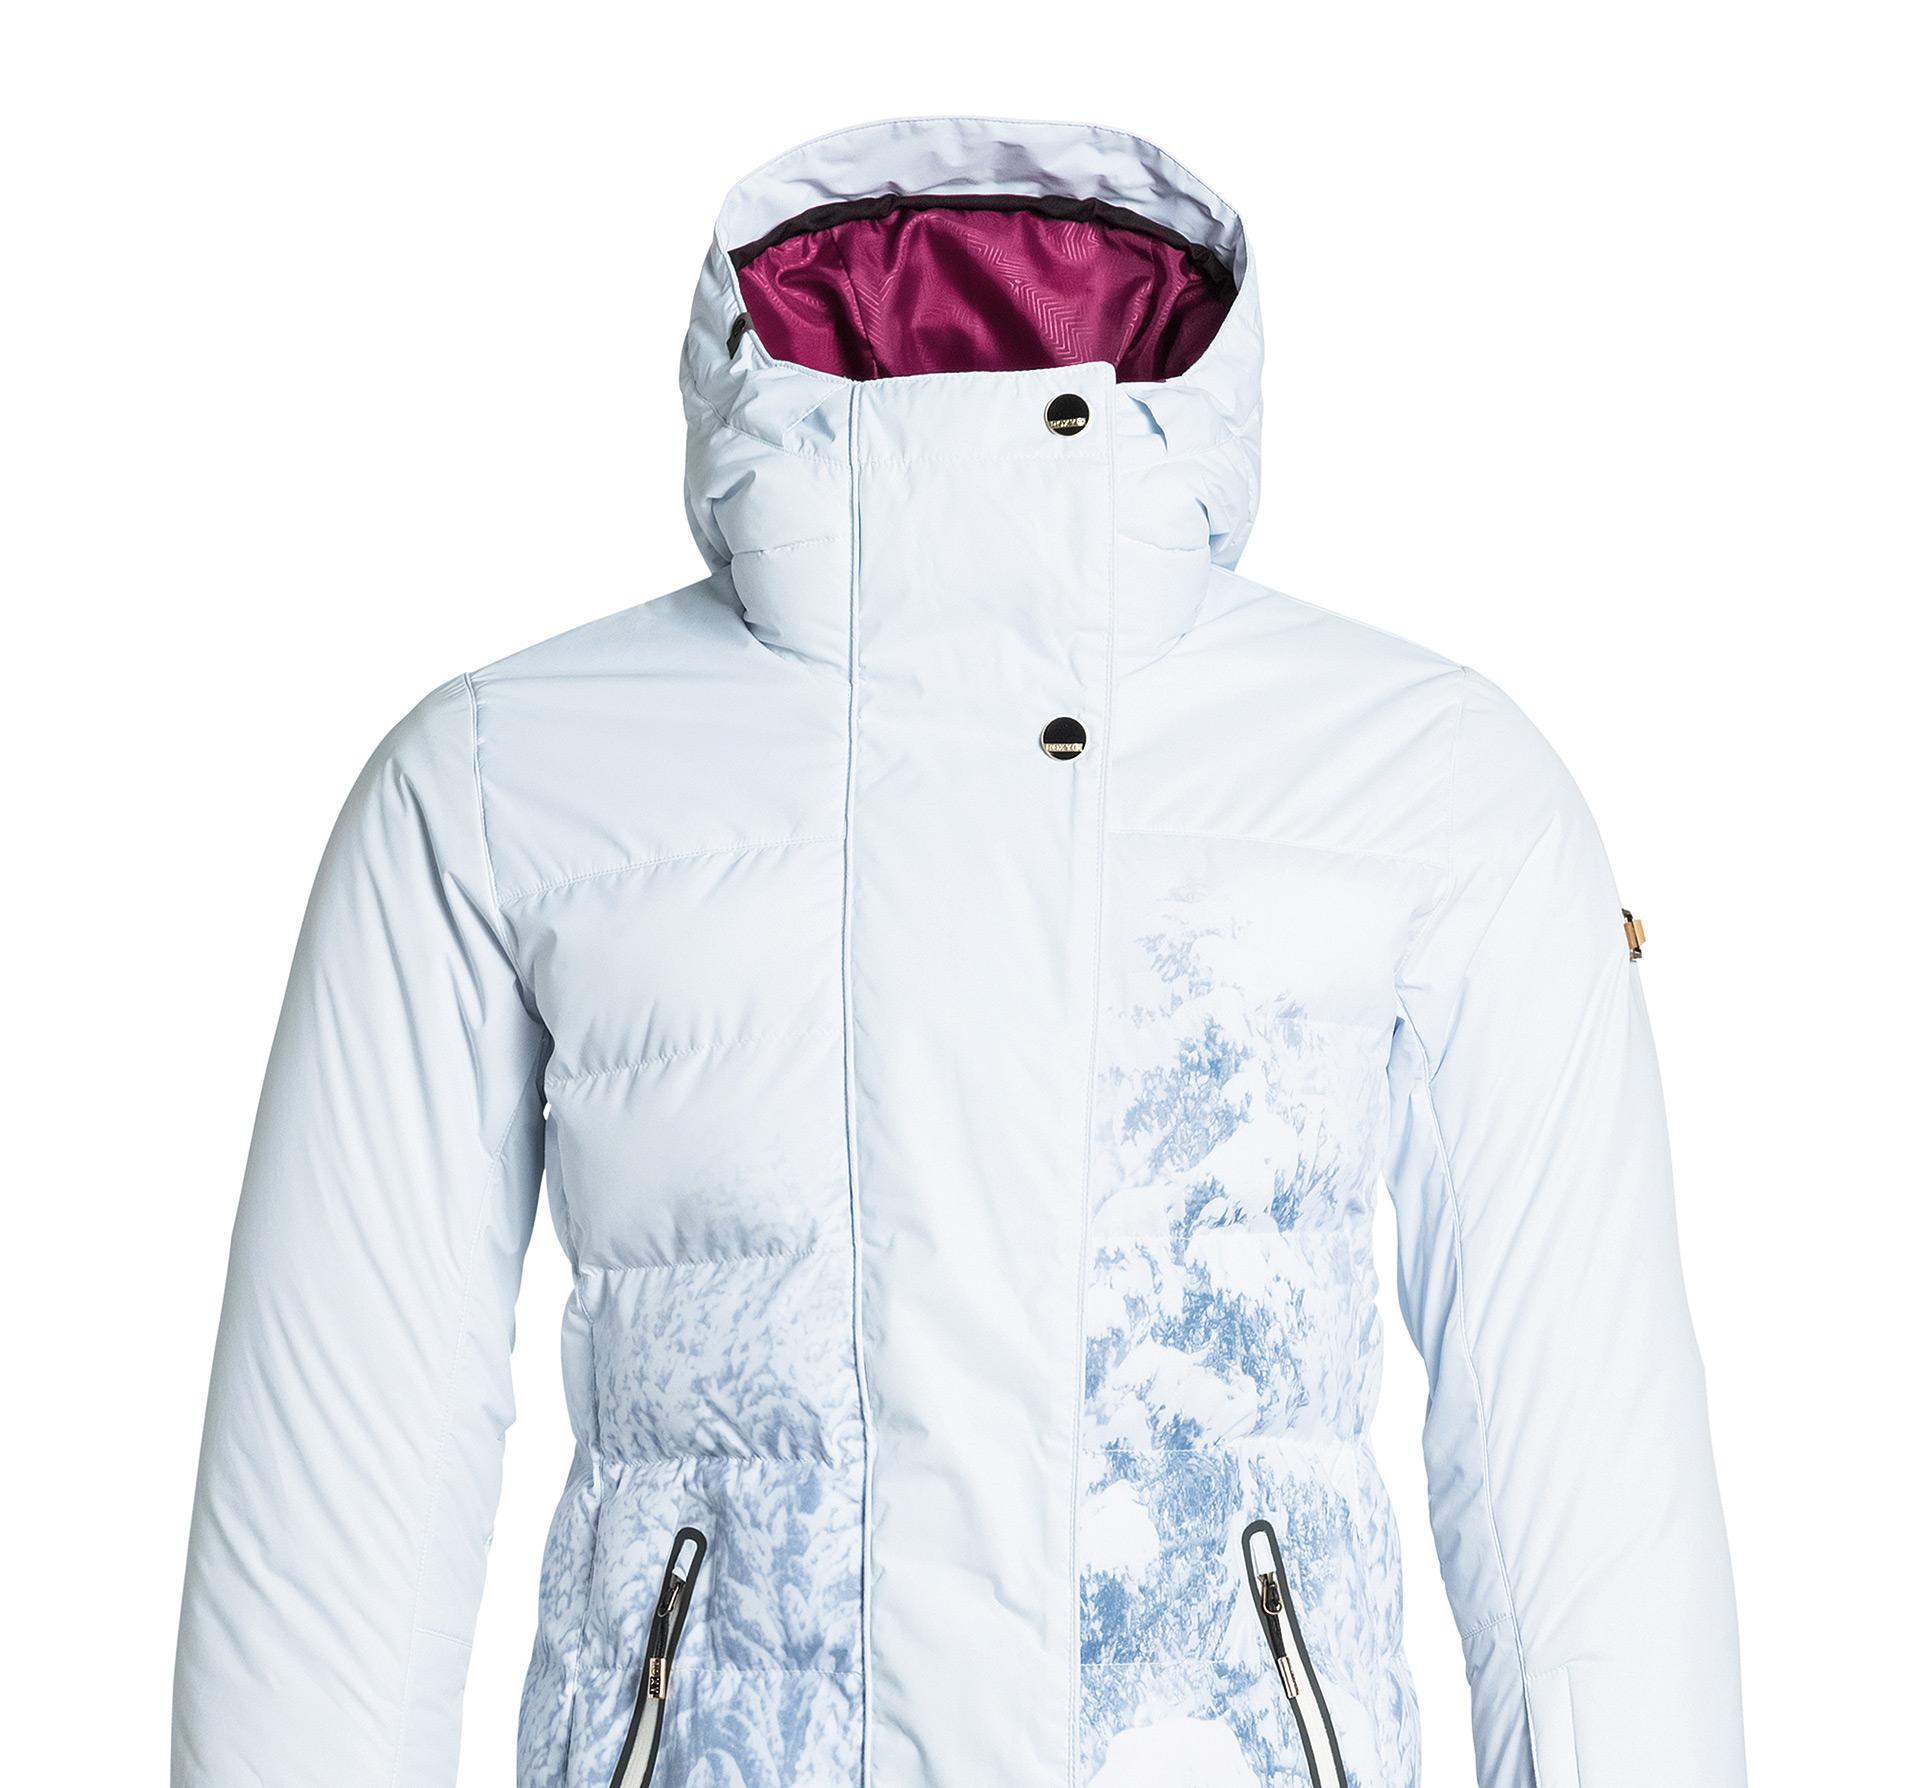 Torah Bright Crystalized Jacket - Roxy